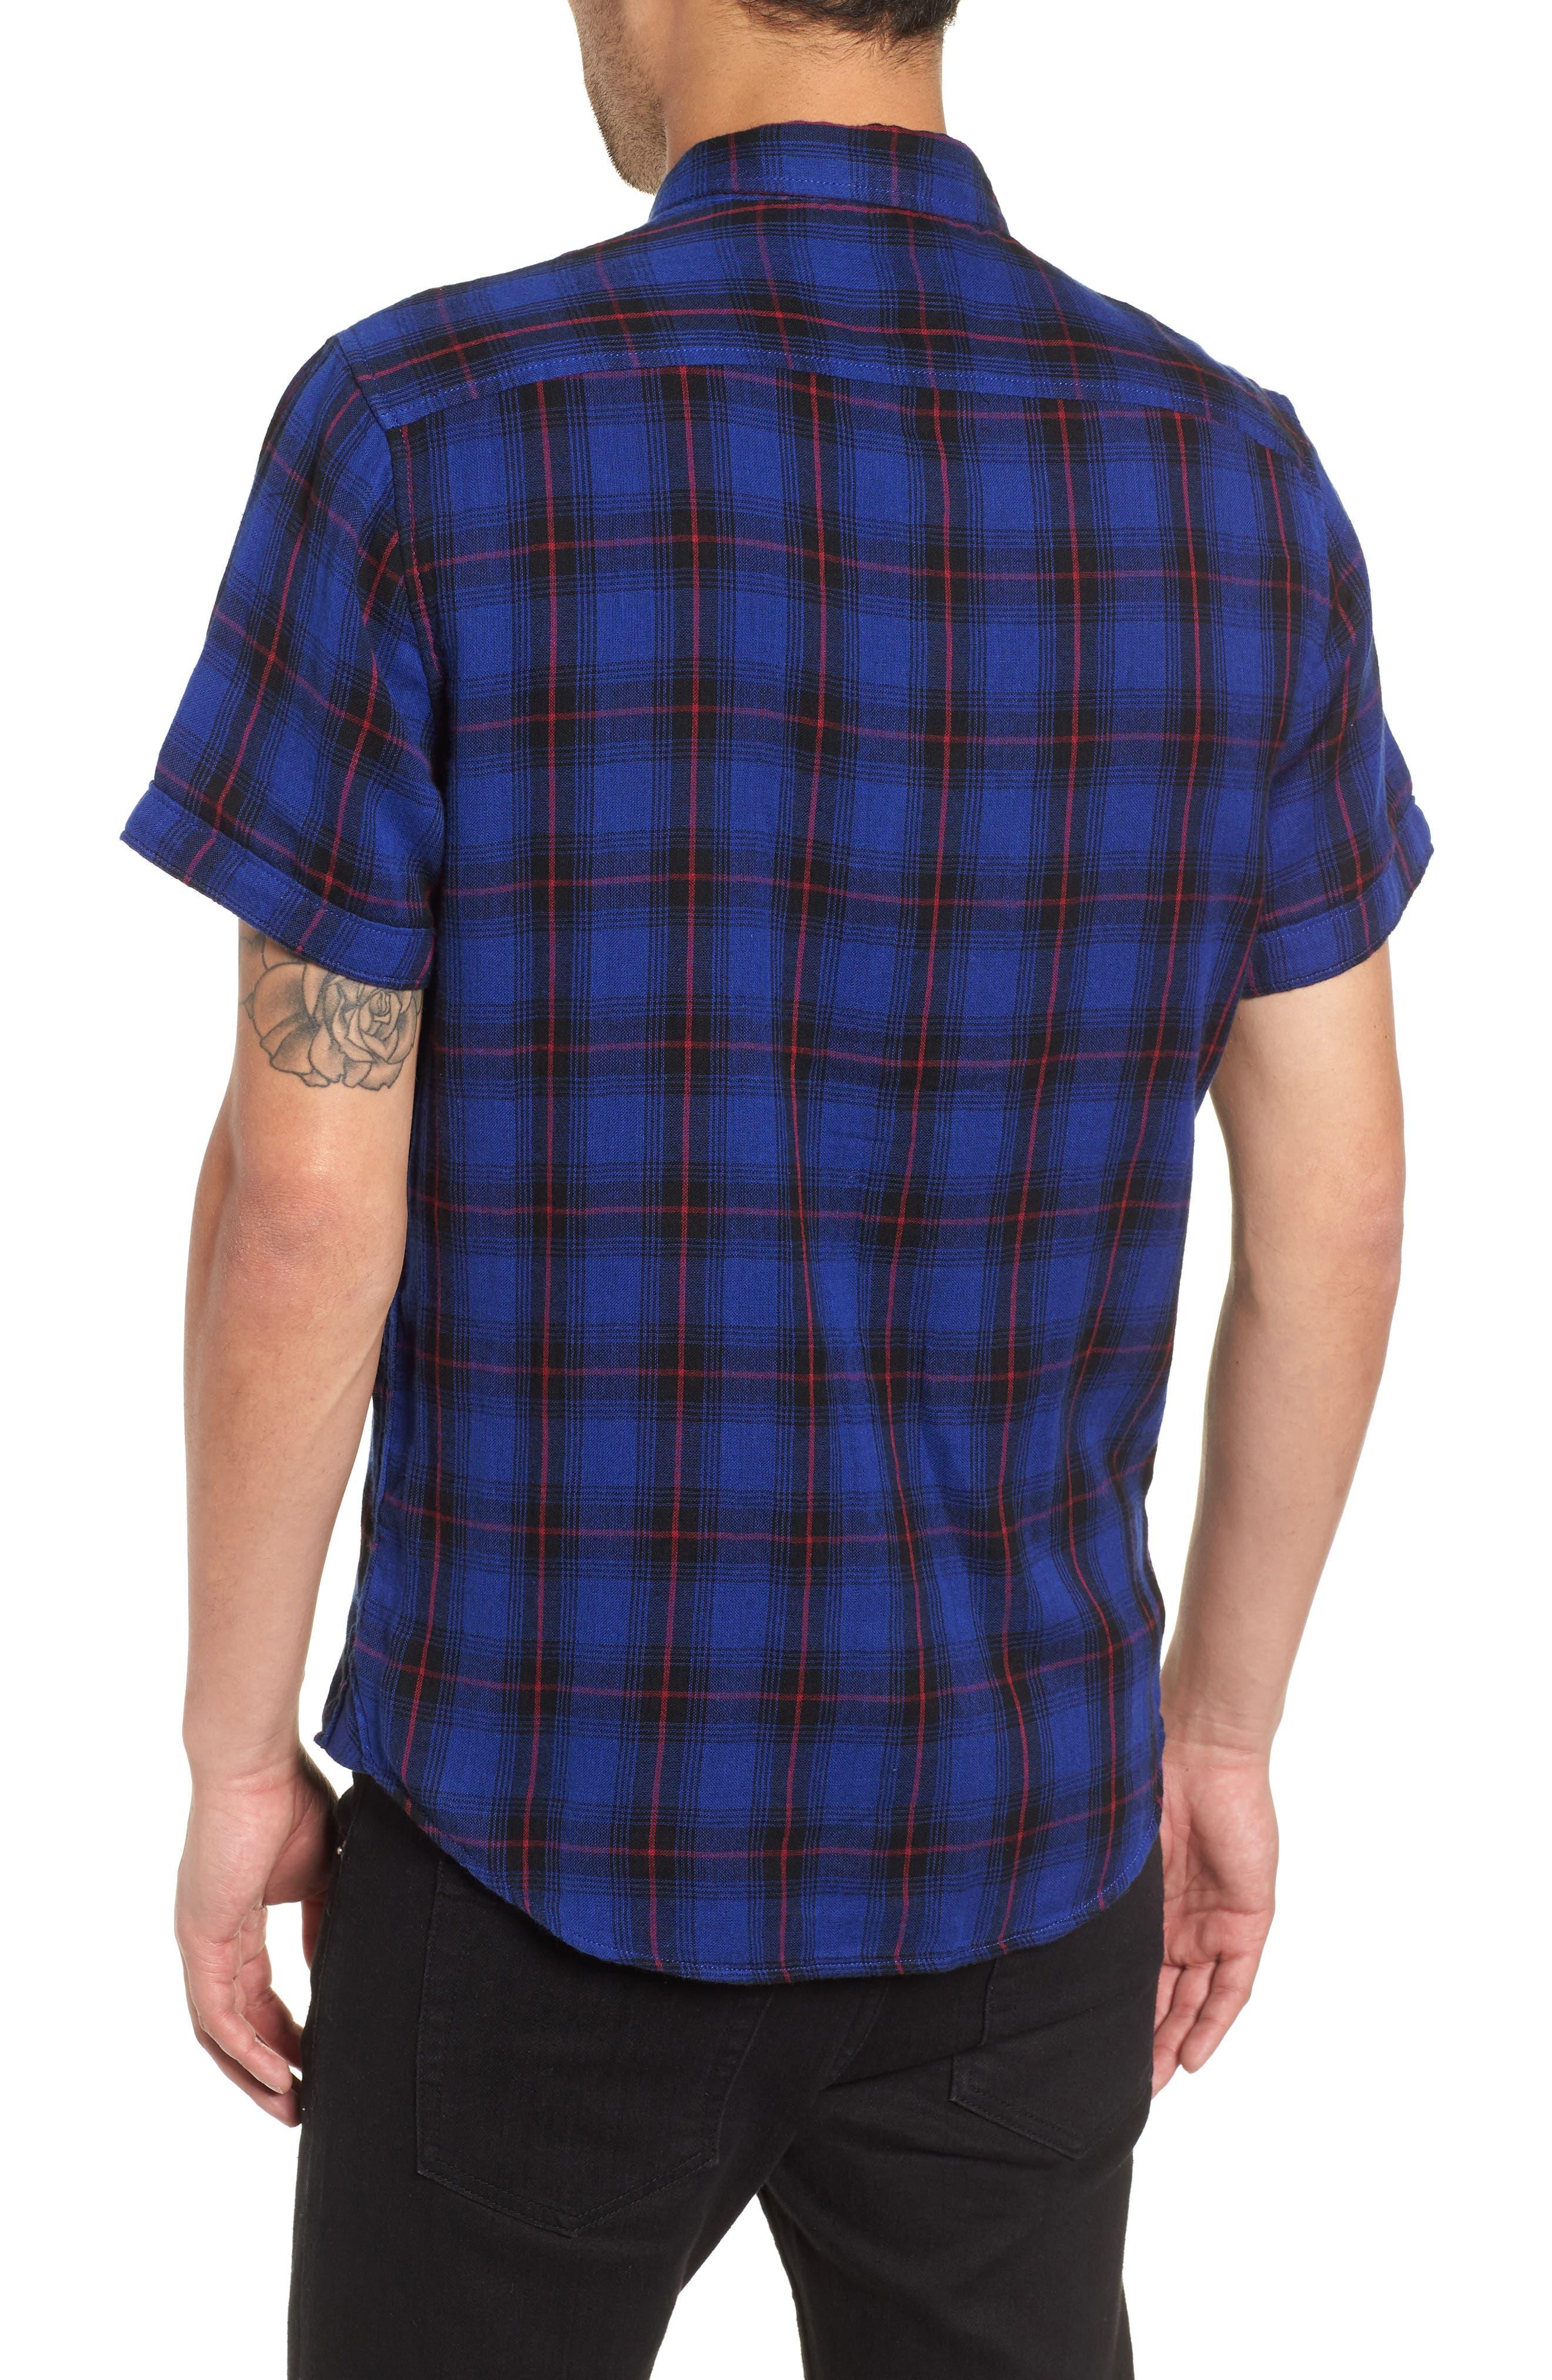 Plaid Woven Shirt,                             Alternate thumbnail 2, color,                             BLUE BLACK LUCA PLAID